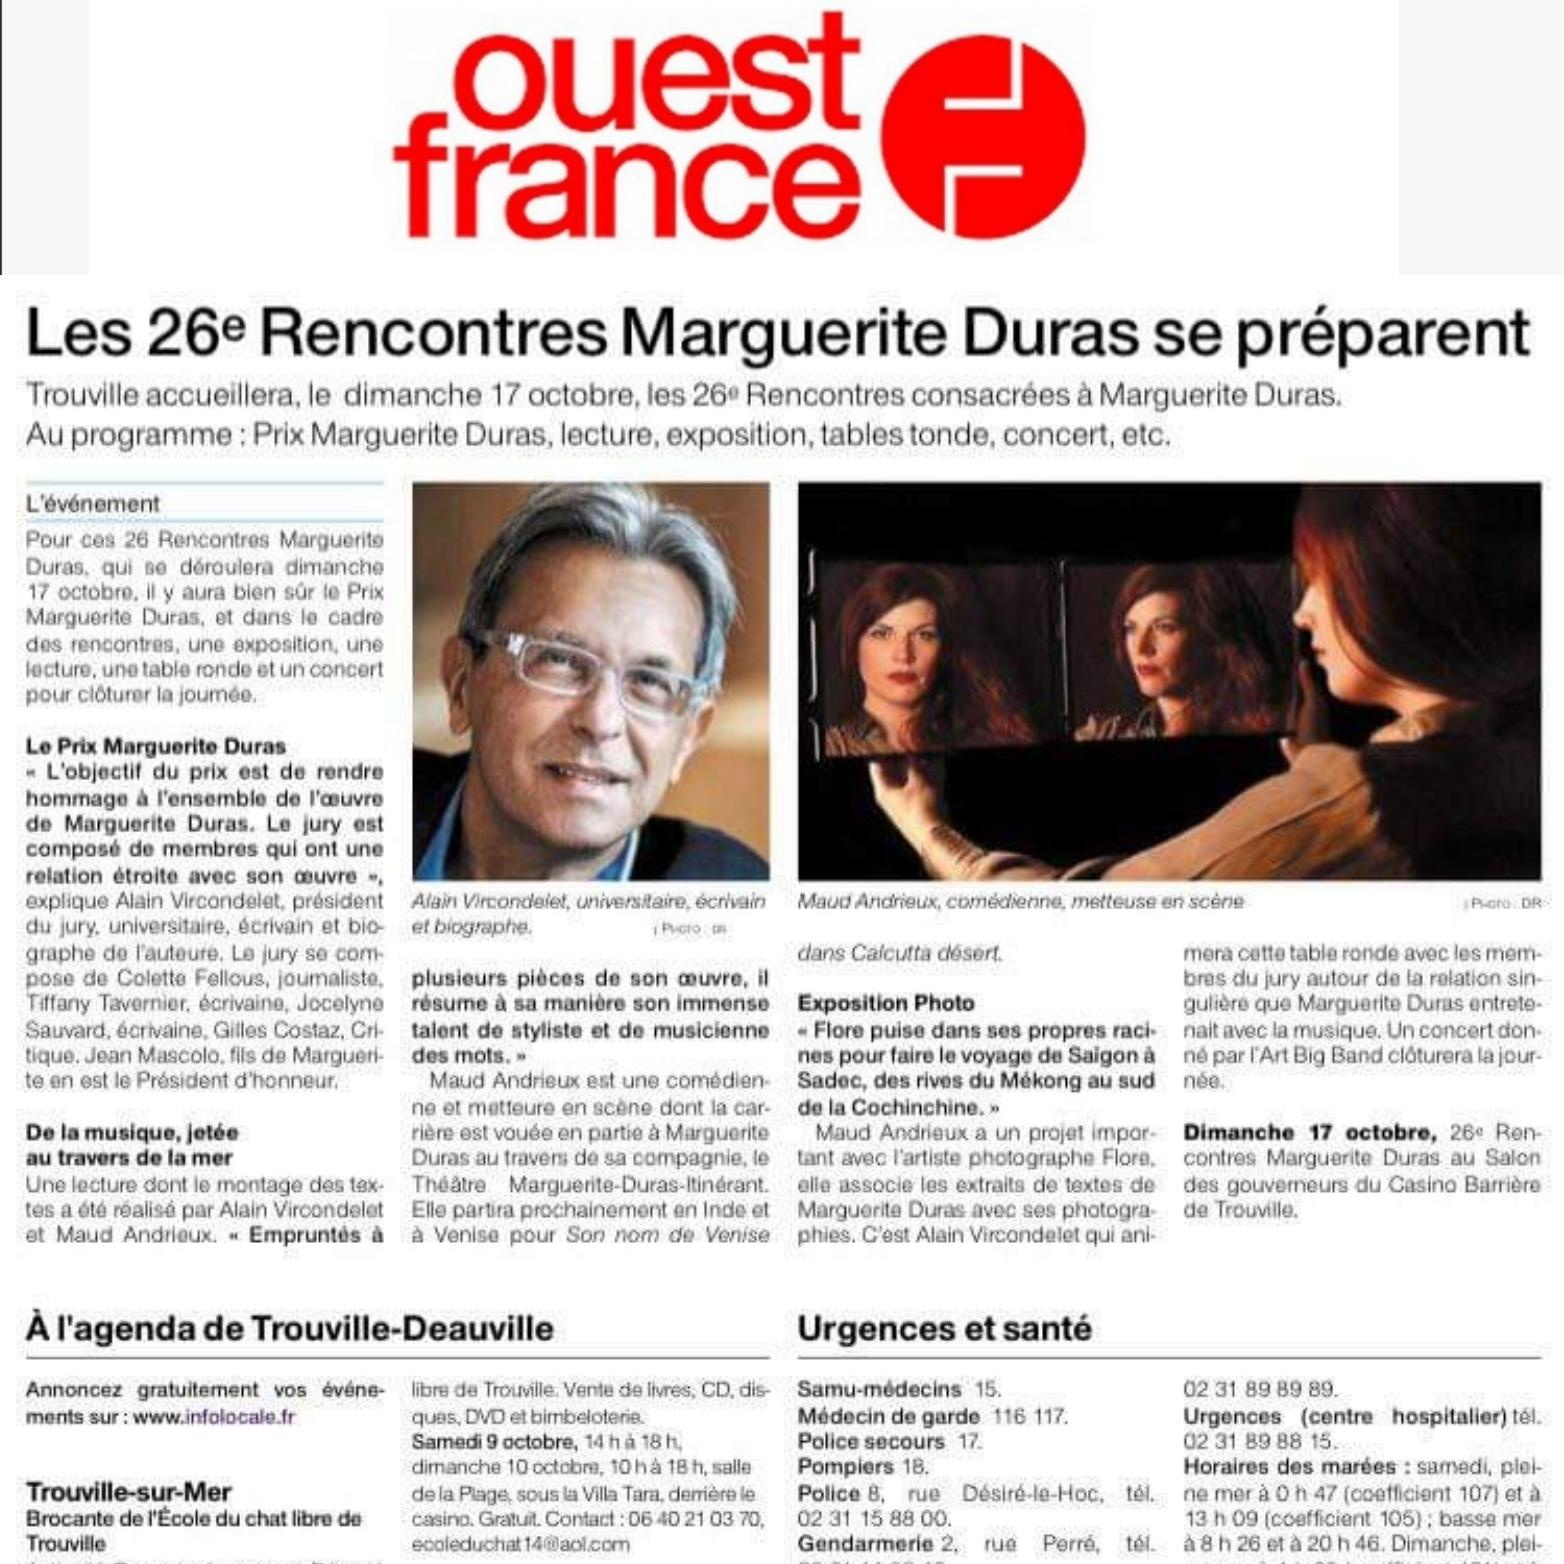 Maud Andrieux, Ouest-France, Rencontres Marguerite Duras, Alain Vircondelet, Judith Magre, Maud Andrieux, Jocelyne Sauvard, Tiffany Tavernier